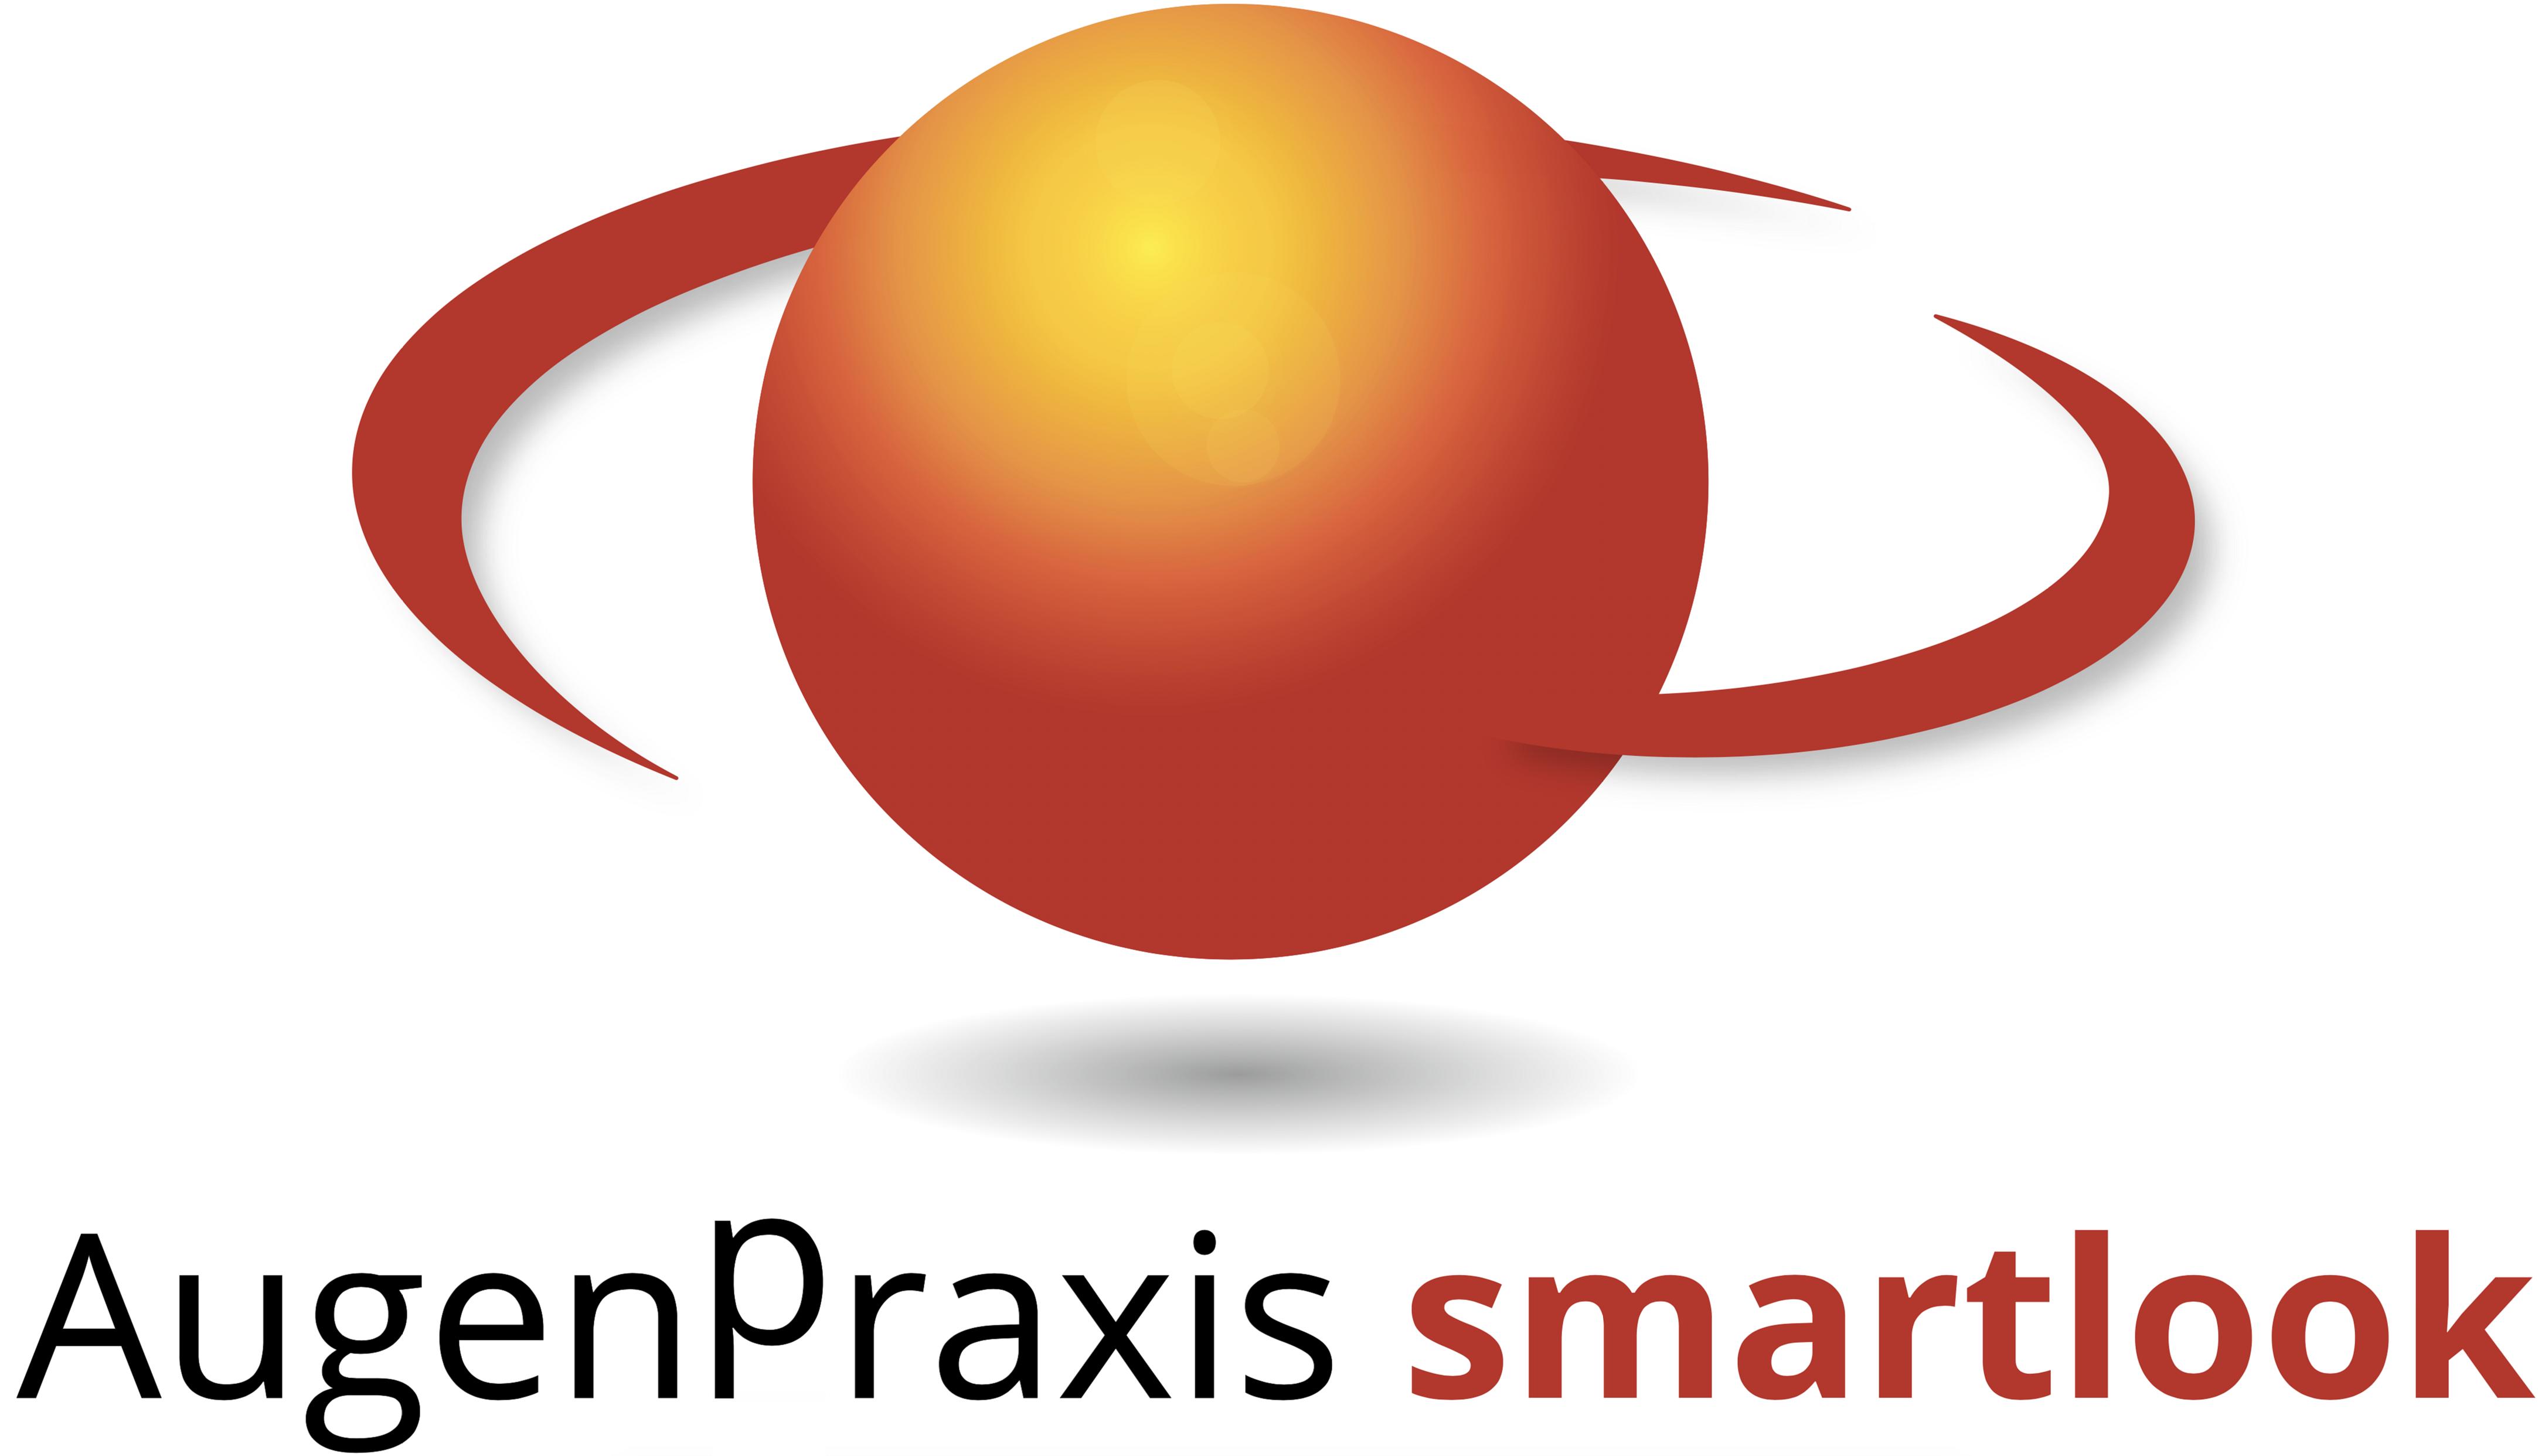 AugenPraxis smartlook AG